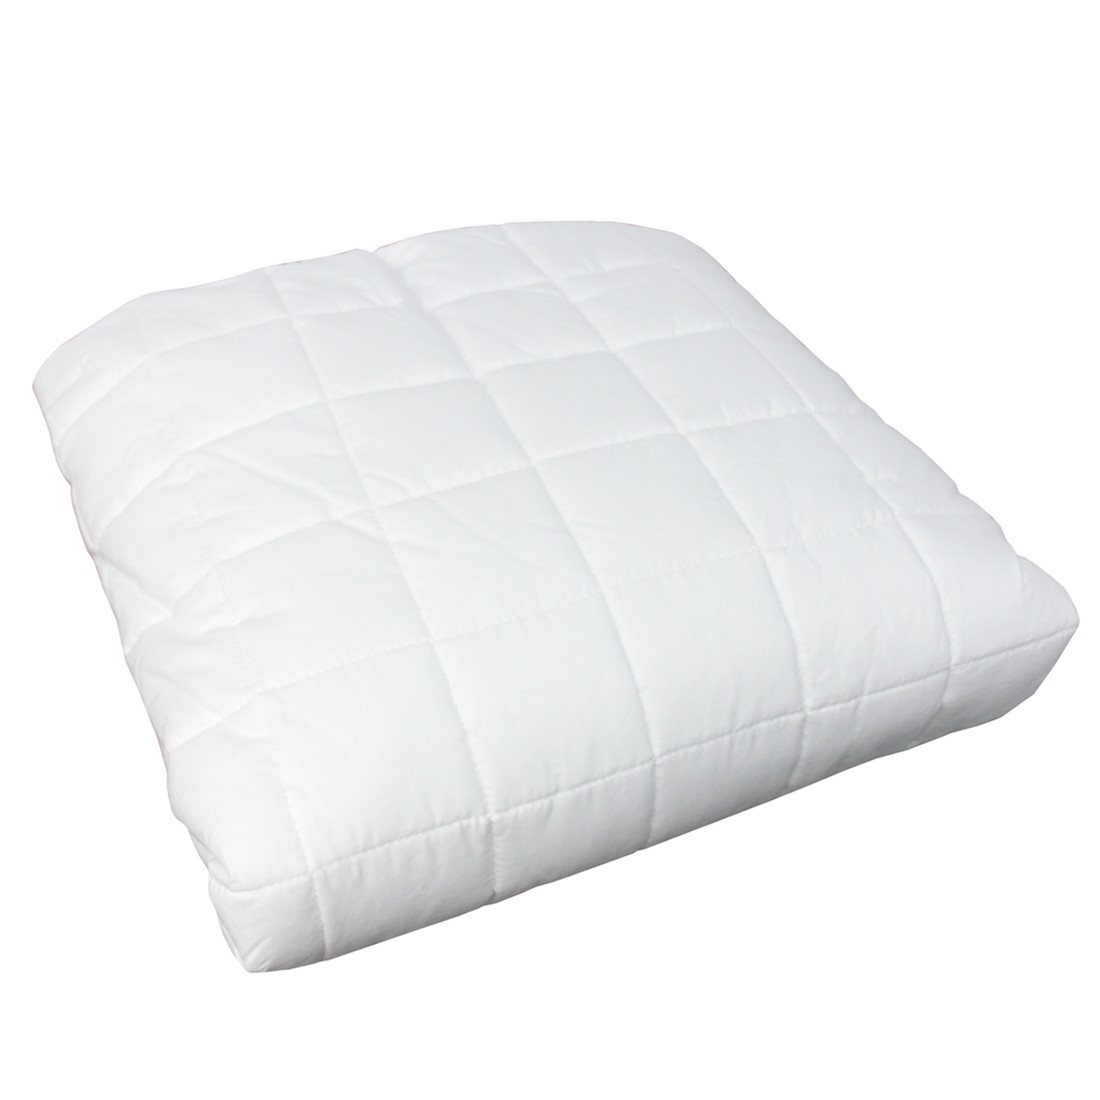 Colcha Com Elástico Percal 200 Fios Cubos branca